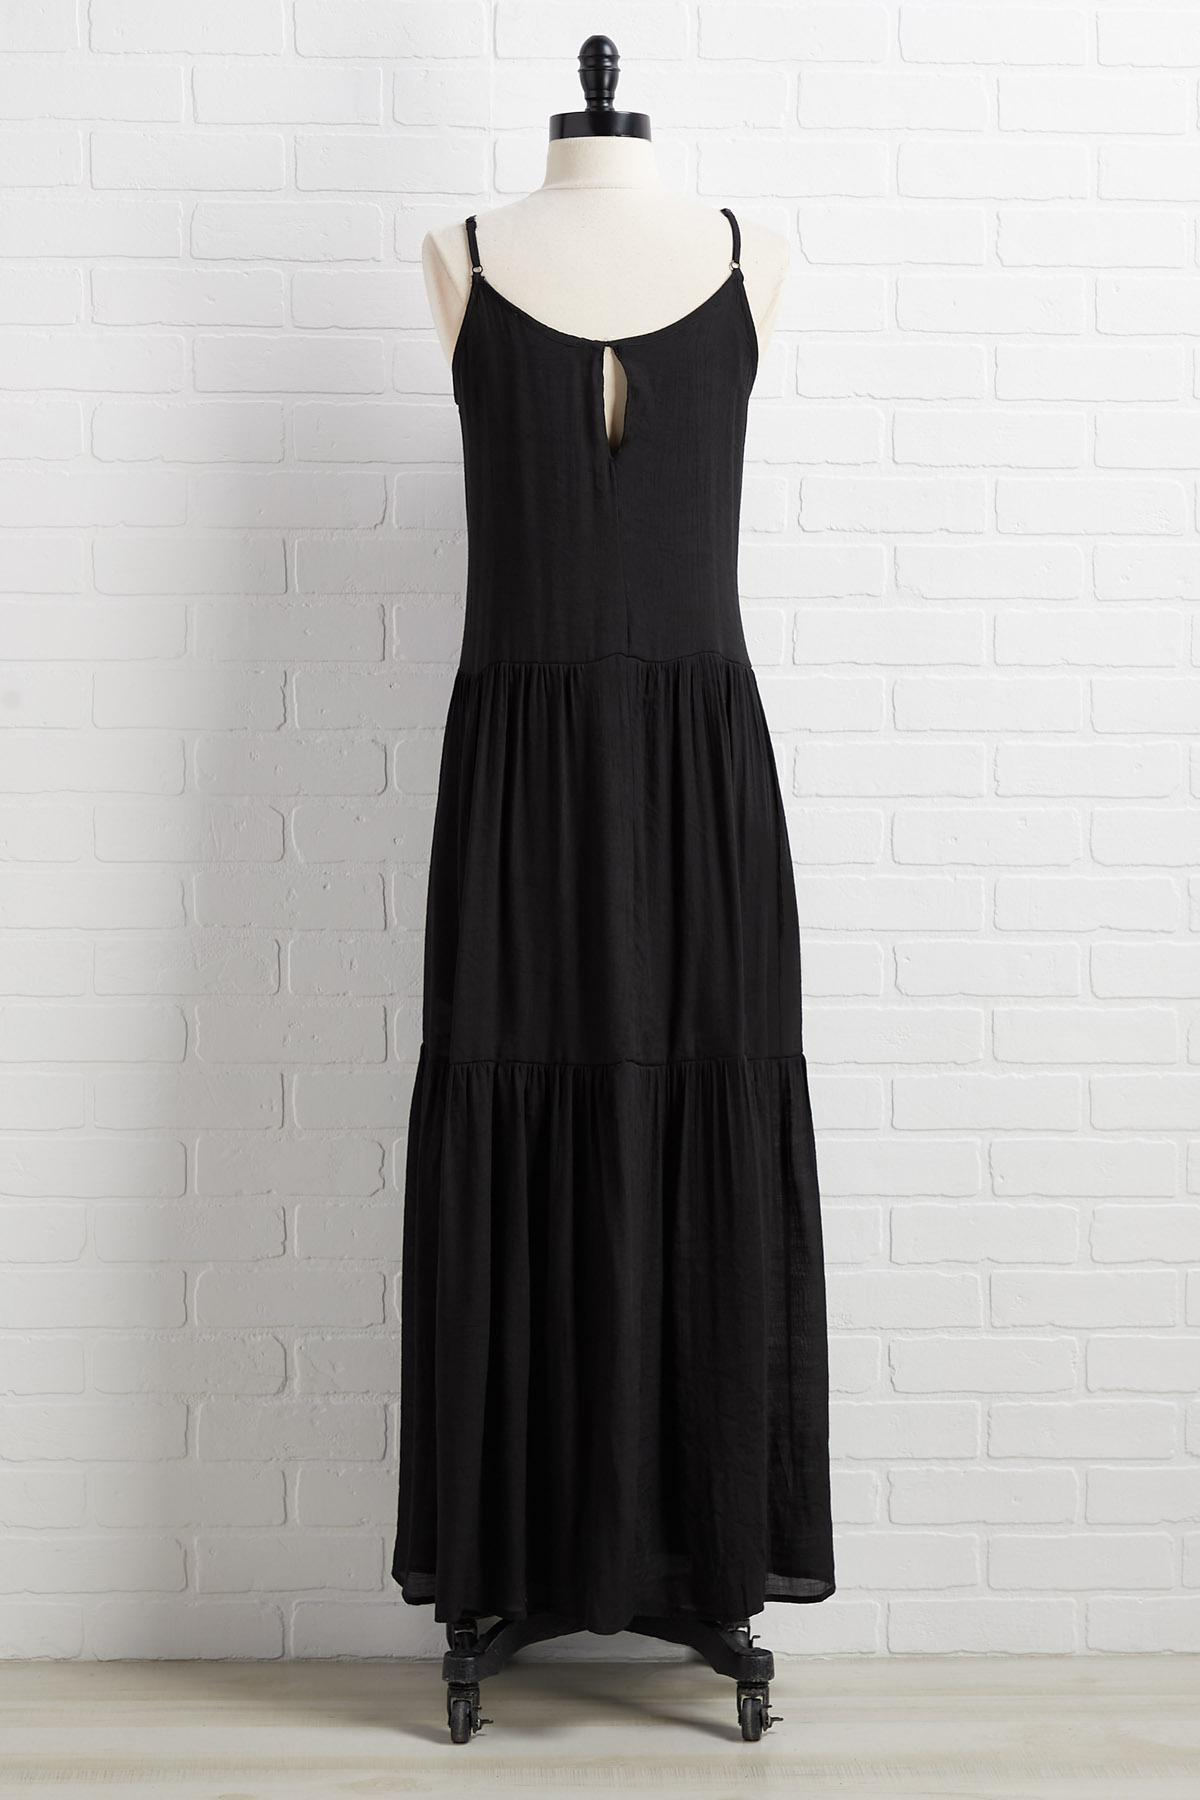 Made Ya Look Dress